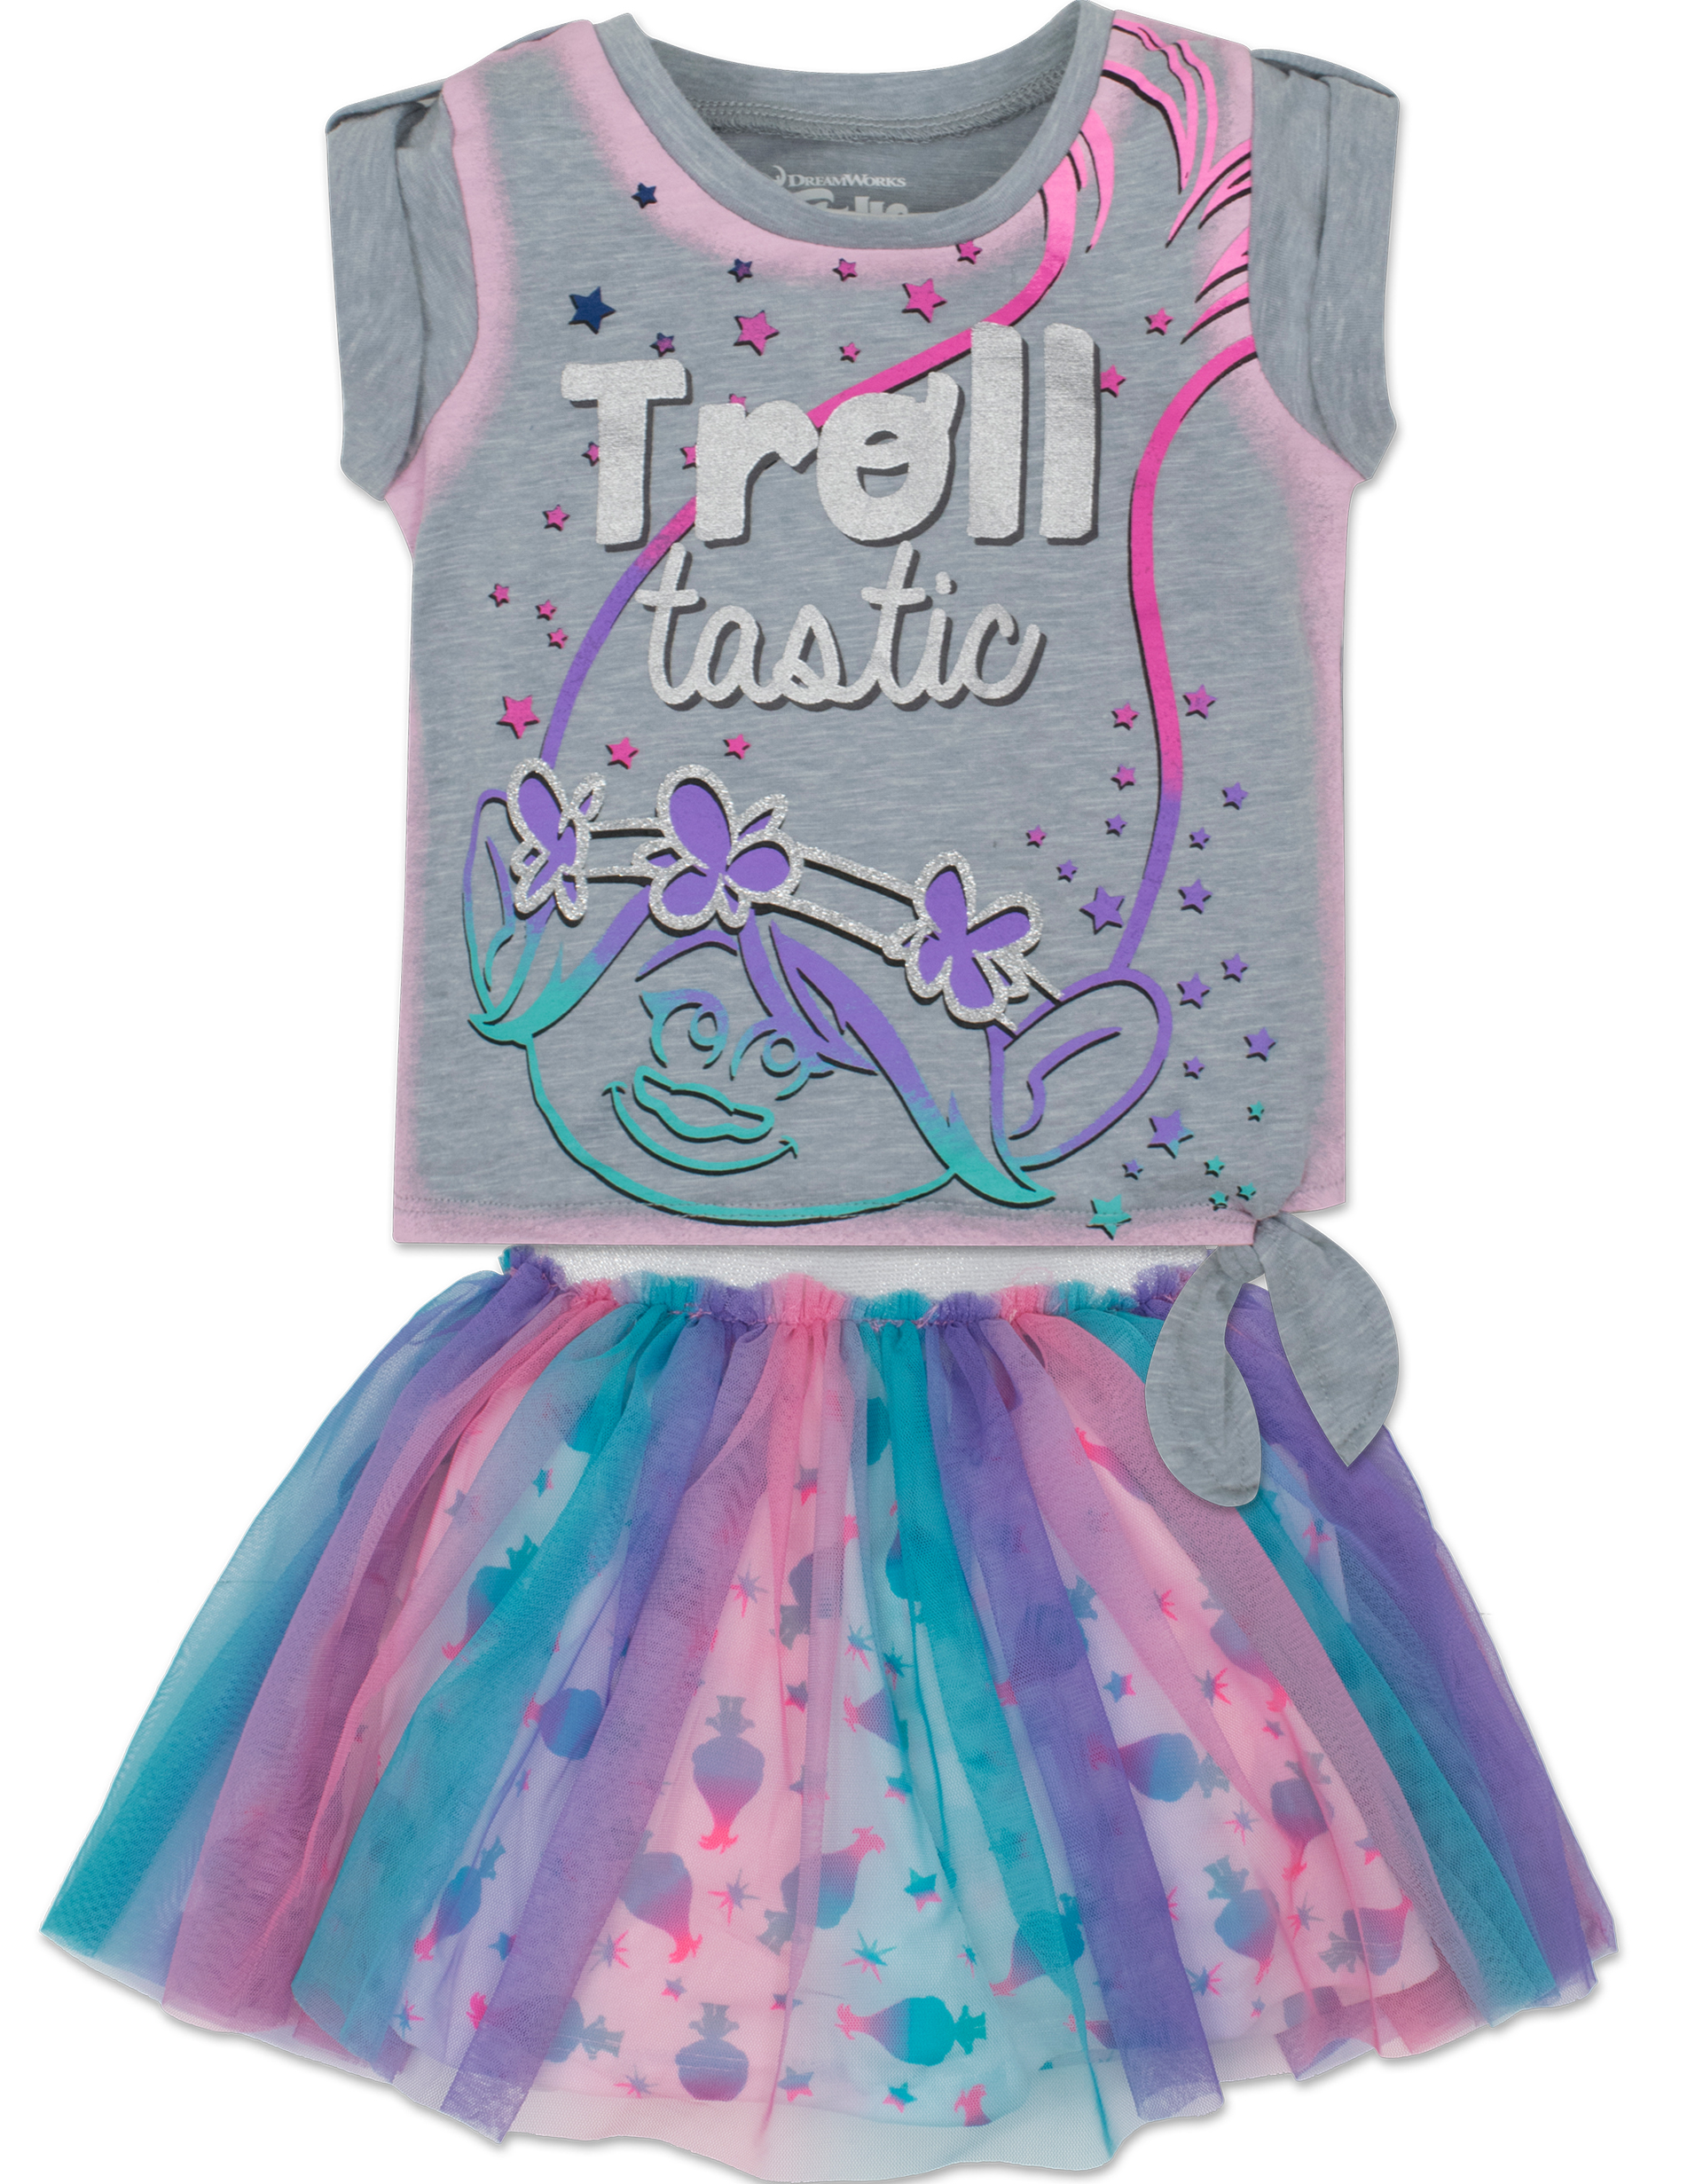 Toddler Girls' Trolls Shirt and Skirt Set -Poppy, Heather Grey